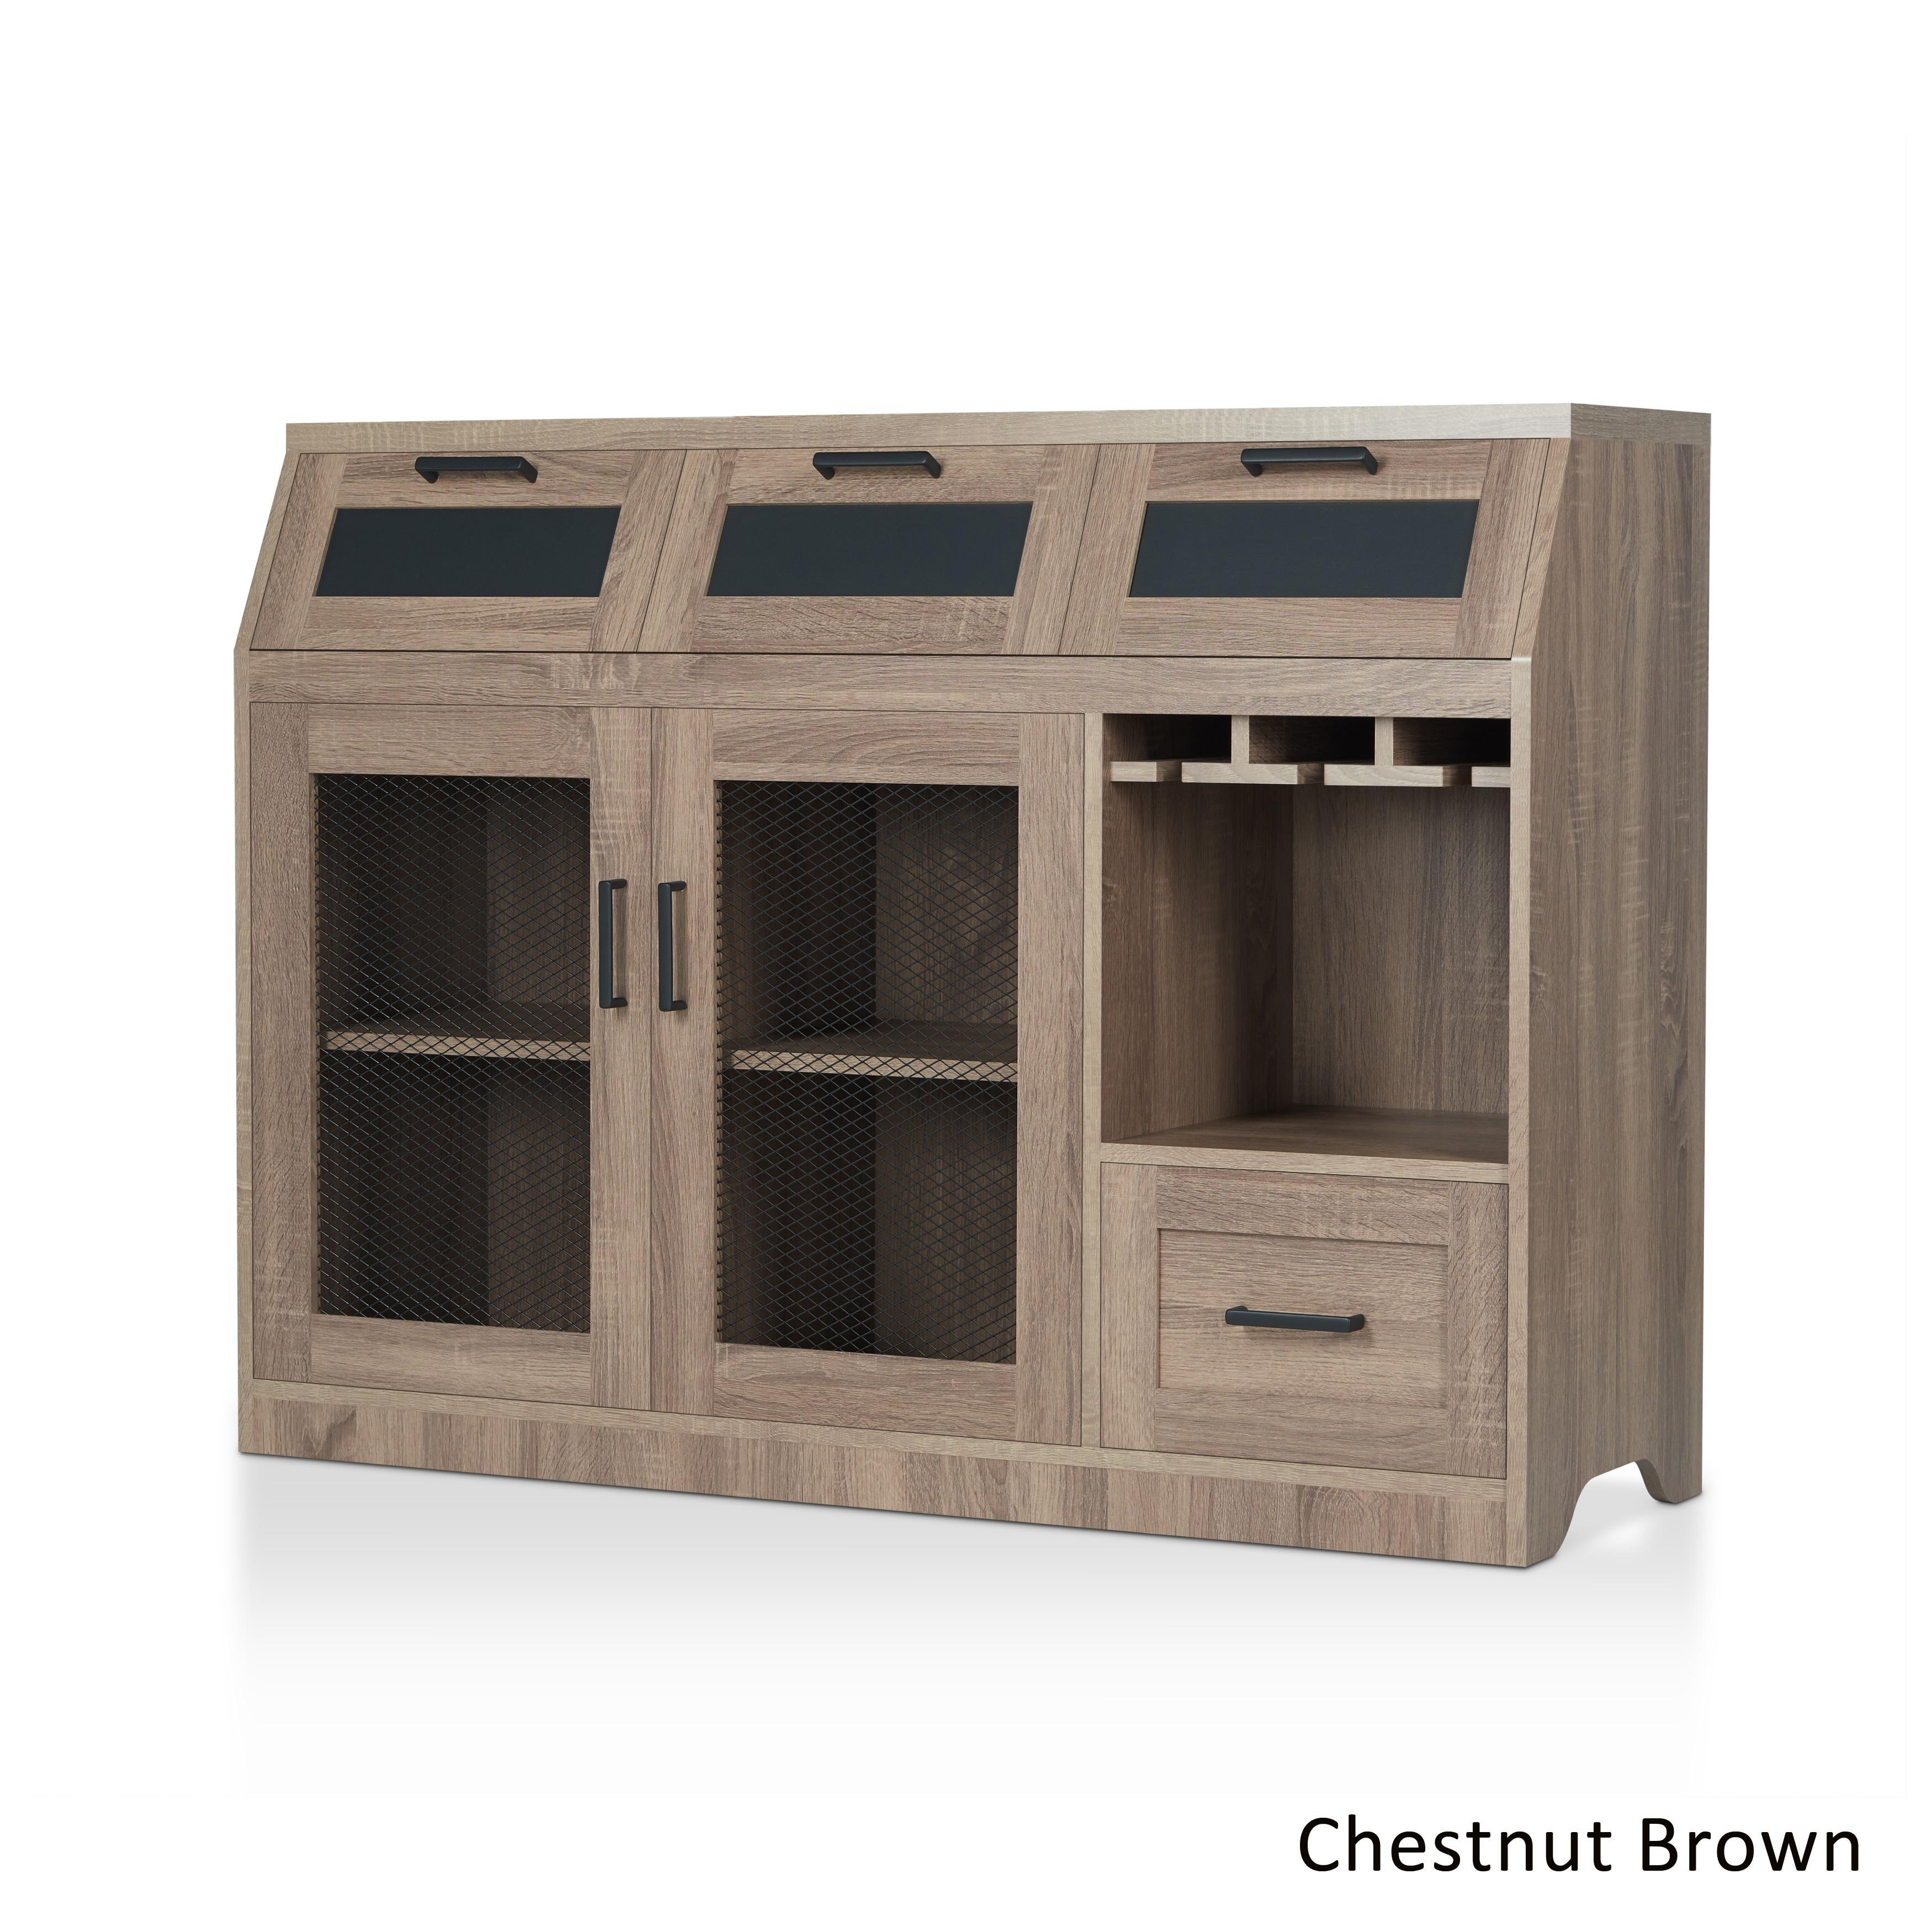 Furniture of america wenoga industrial multi storage for Furniture of america gelenan industrial cement like multi storage buffet